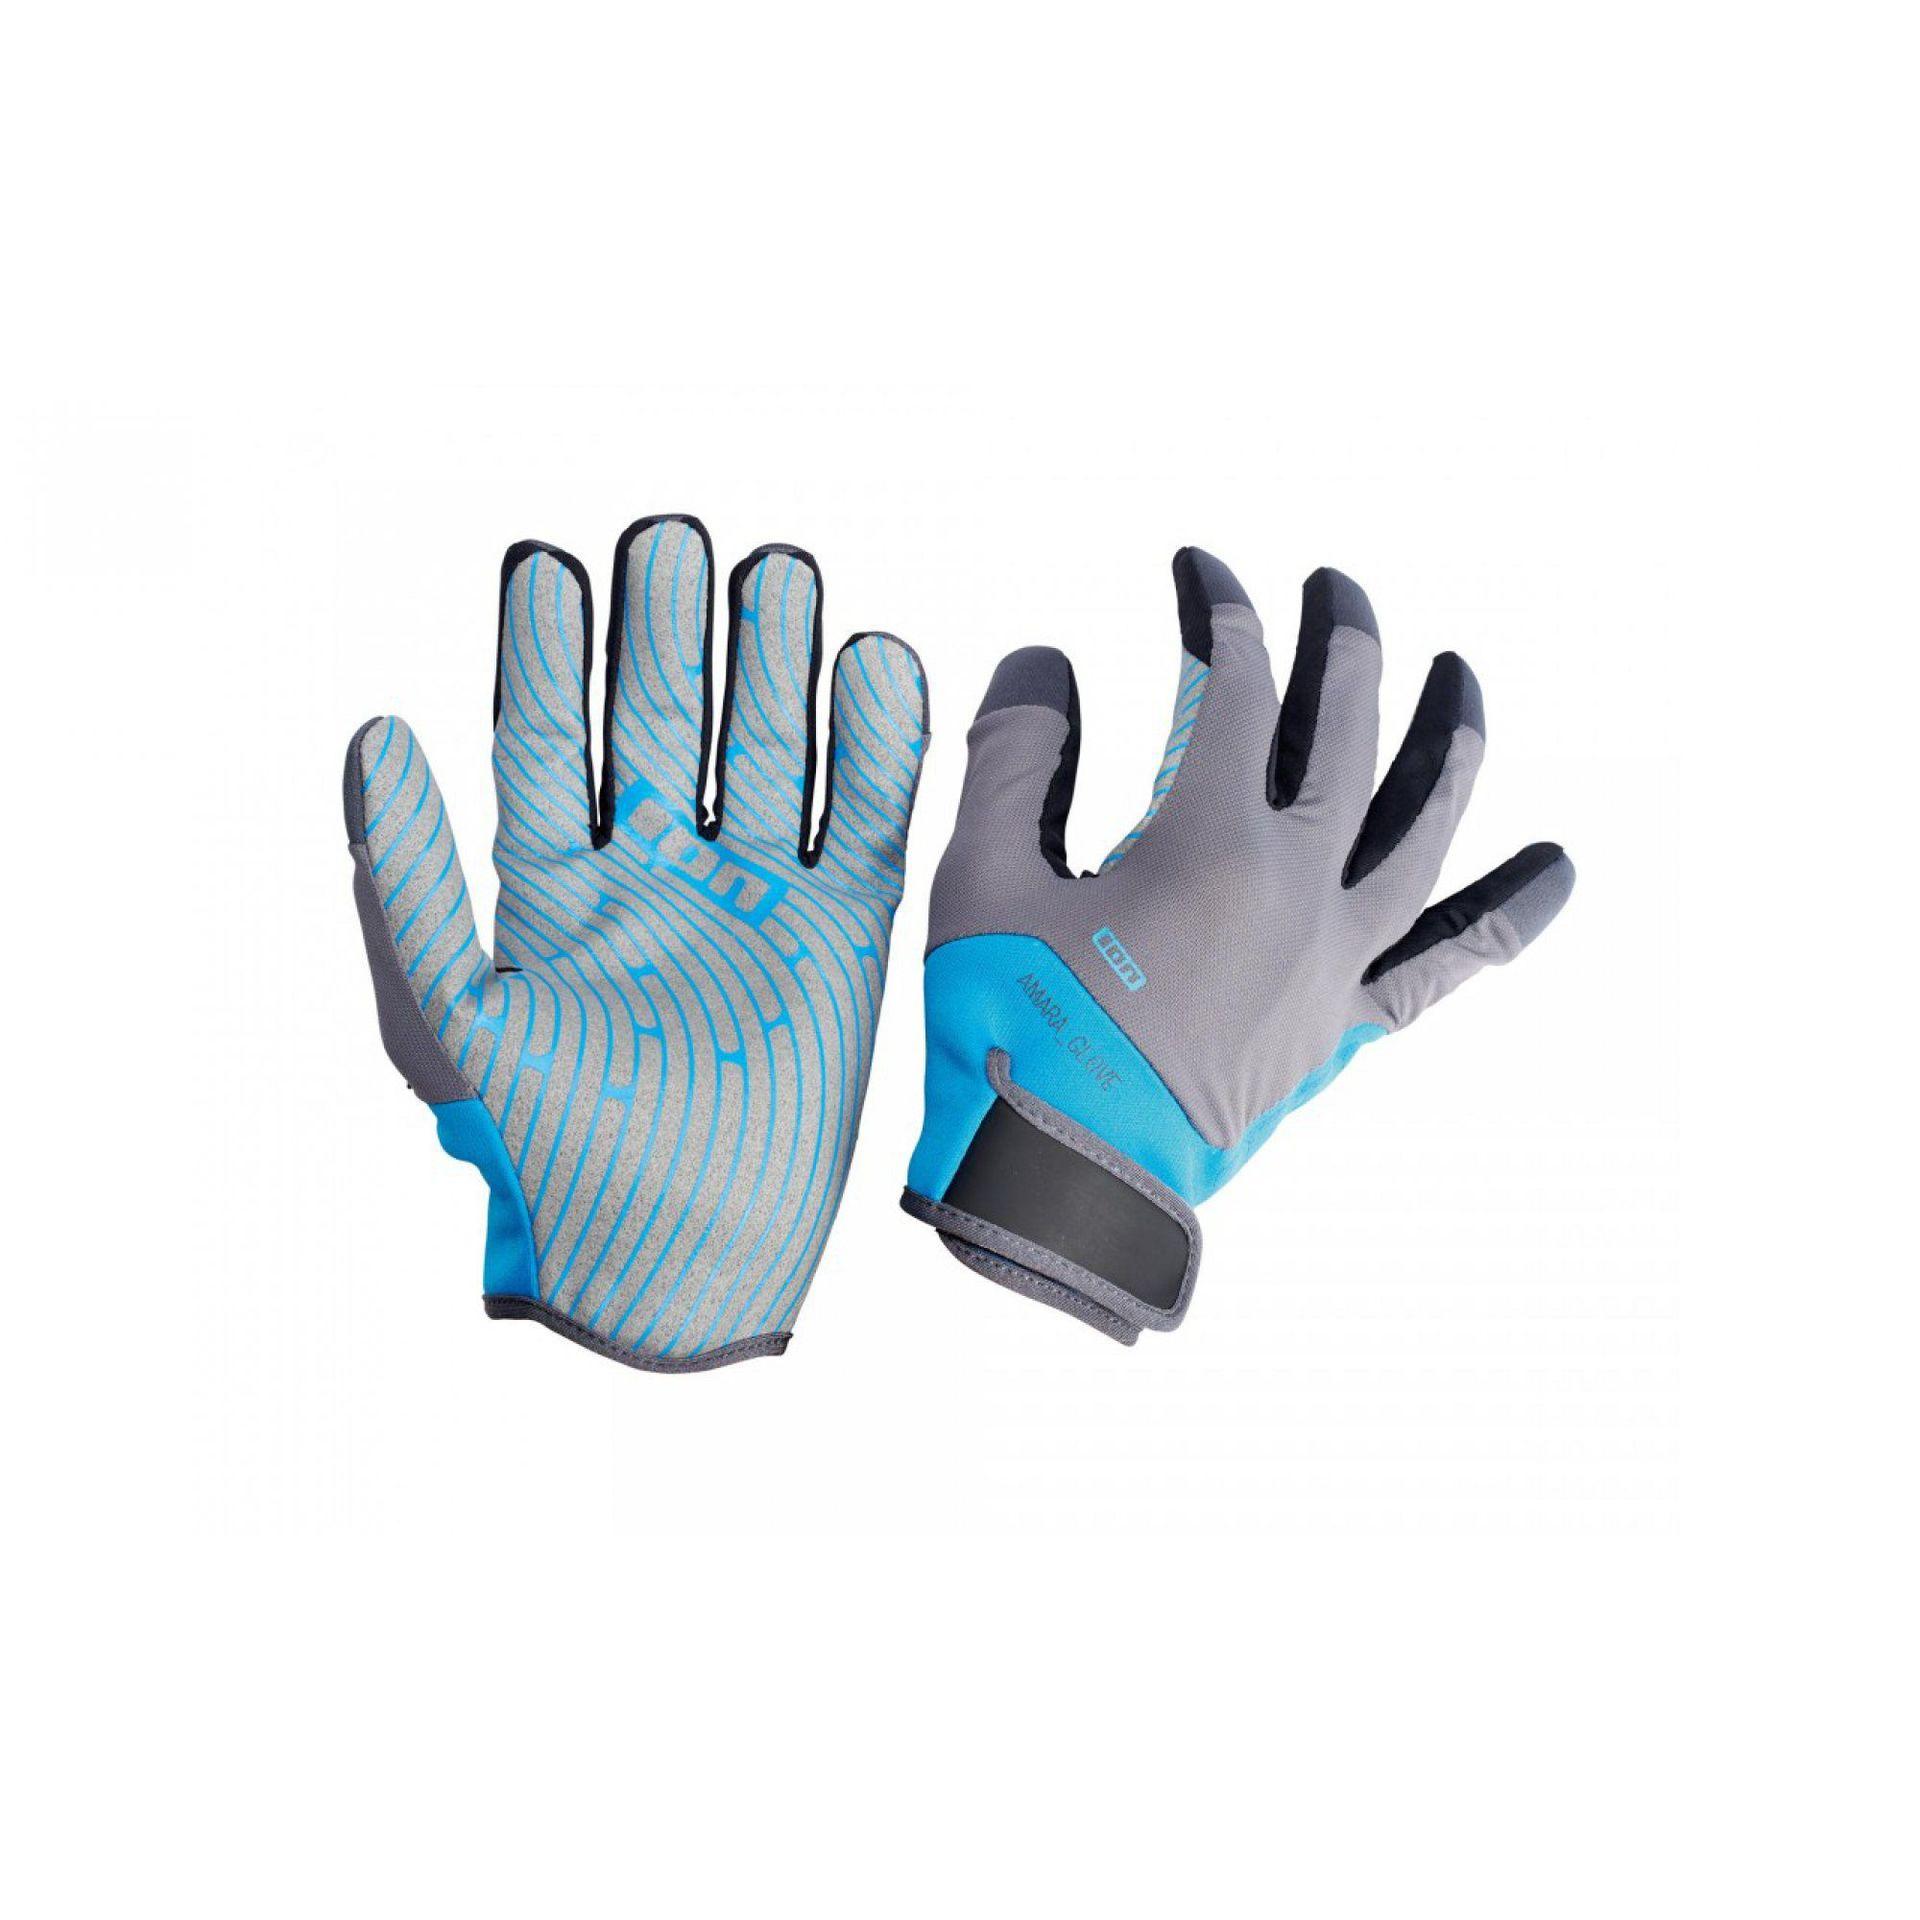 RĘKAWICZKI NEOPRENOWE ION AMARA FULL FINGER 48400-4141 BLUE|GREY